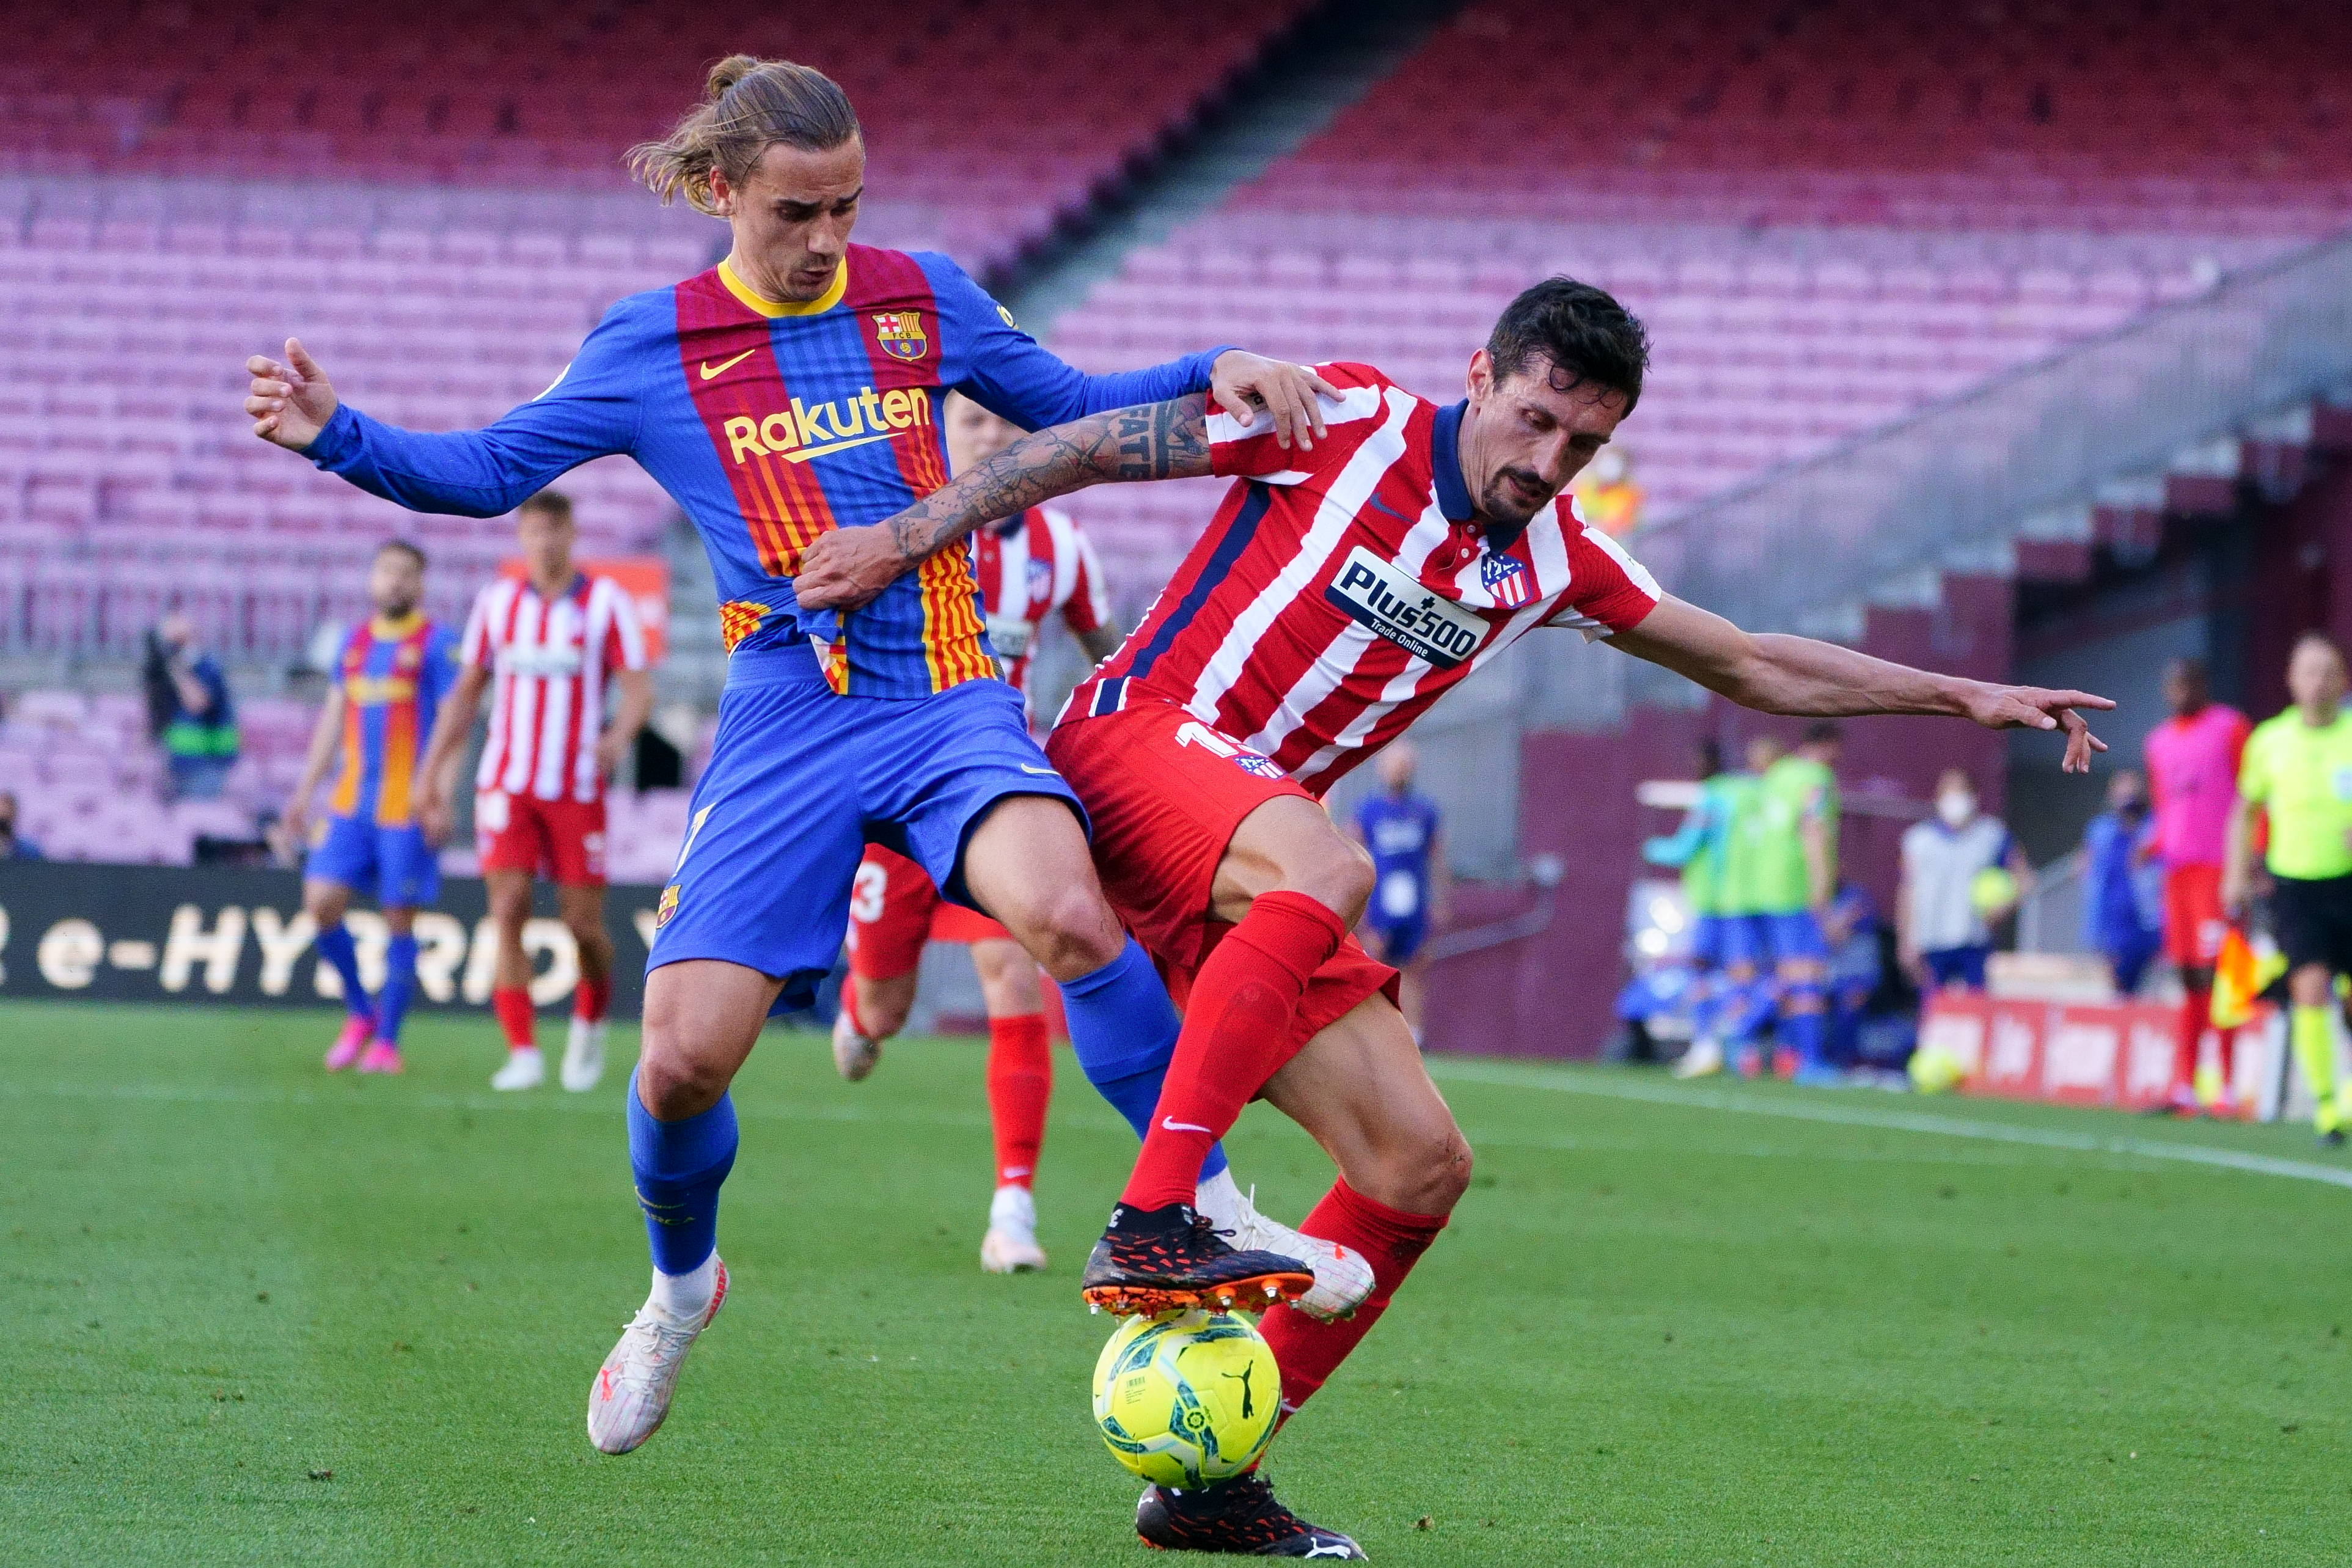 Football Espana - Primera Liga news, fixtures, results, and all the latest  Spanish football and La Liga information